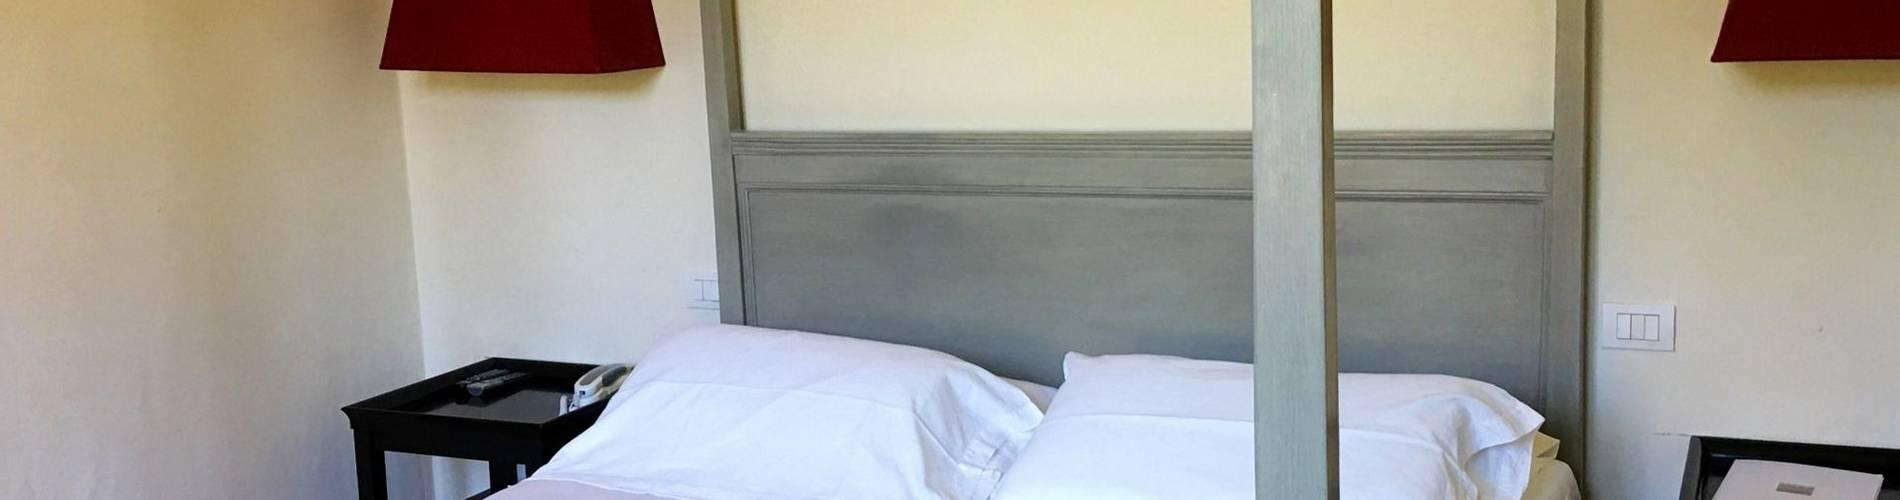 Locanda Palazzone, Umbria, Italy, Double Suite (4).jpg